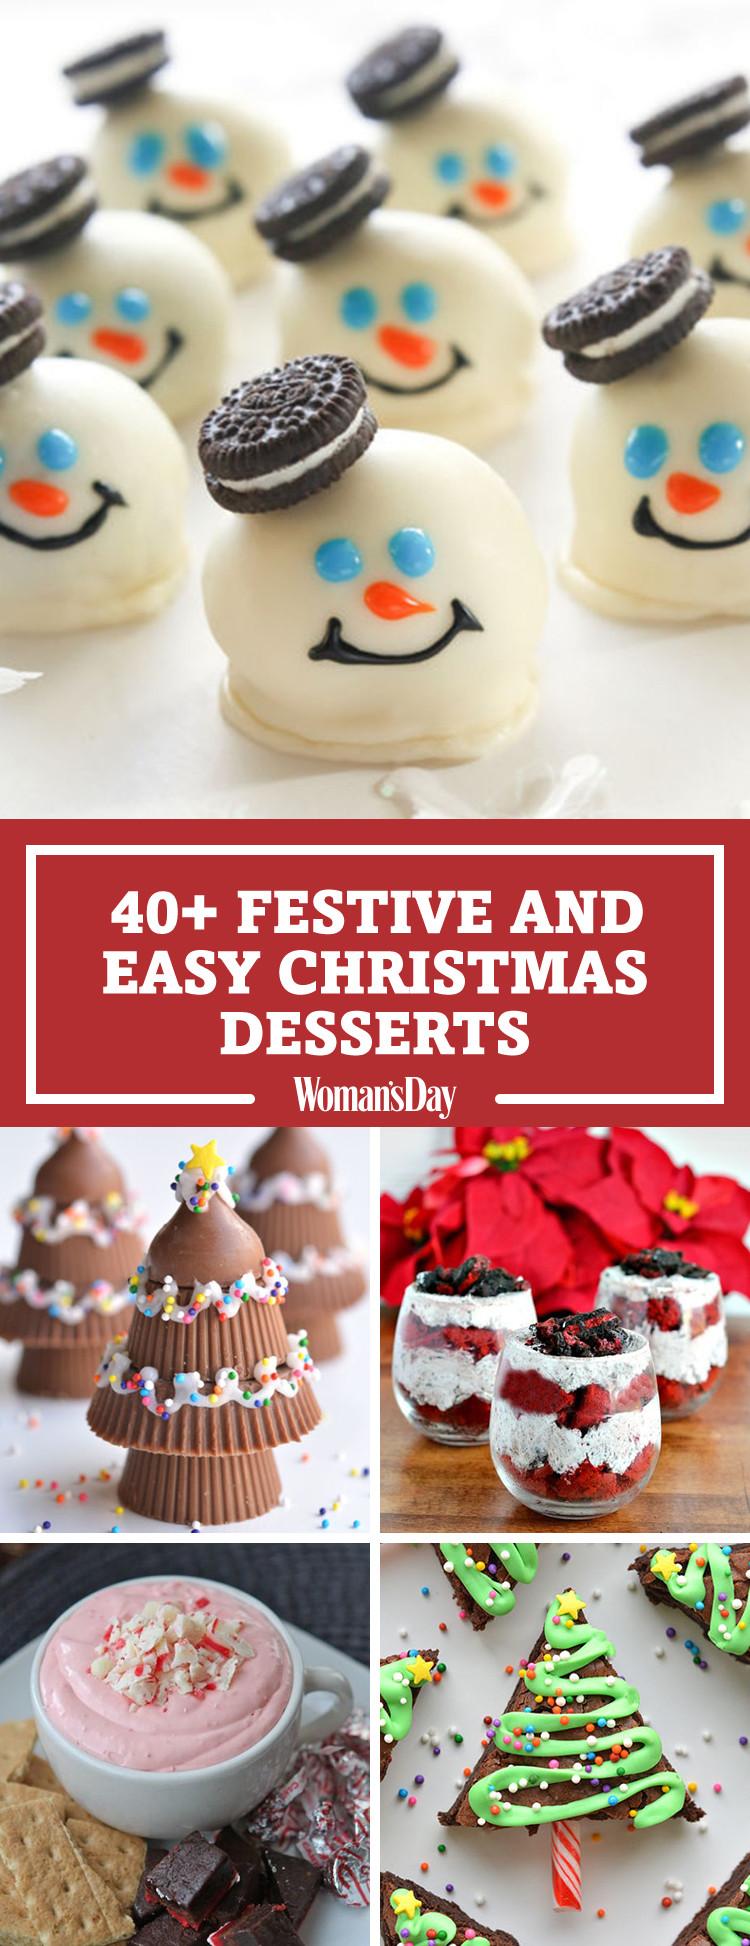 Festive Christmas Desserts  57 Easy Christmas Dessert Recipes Best Ideas for Fun